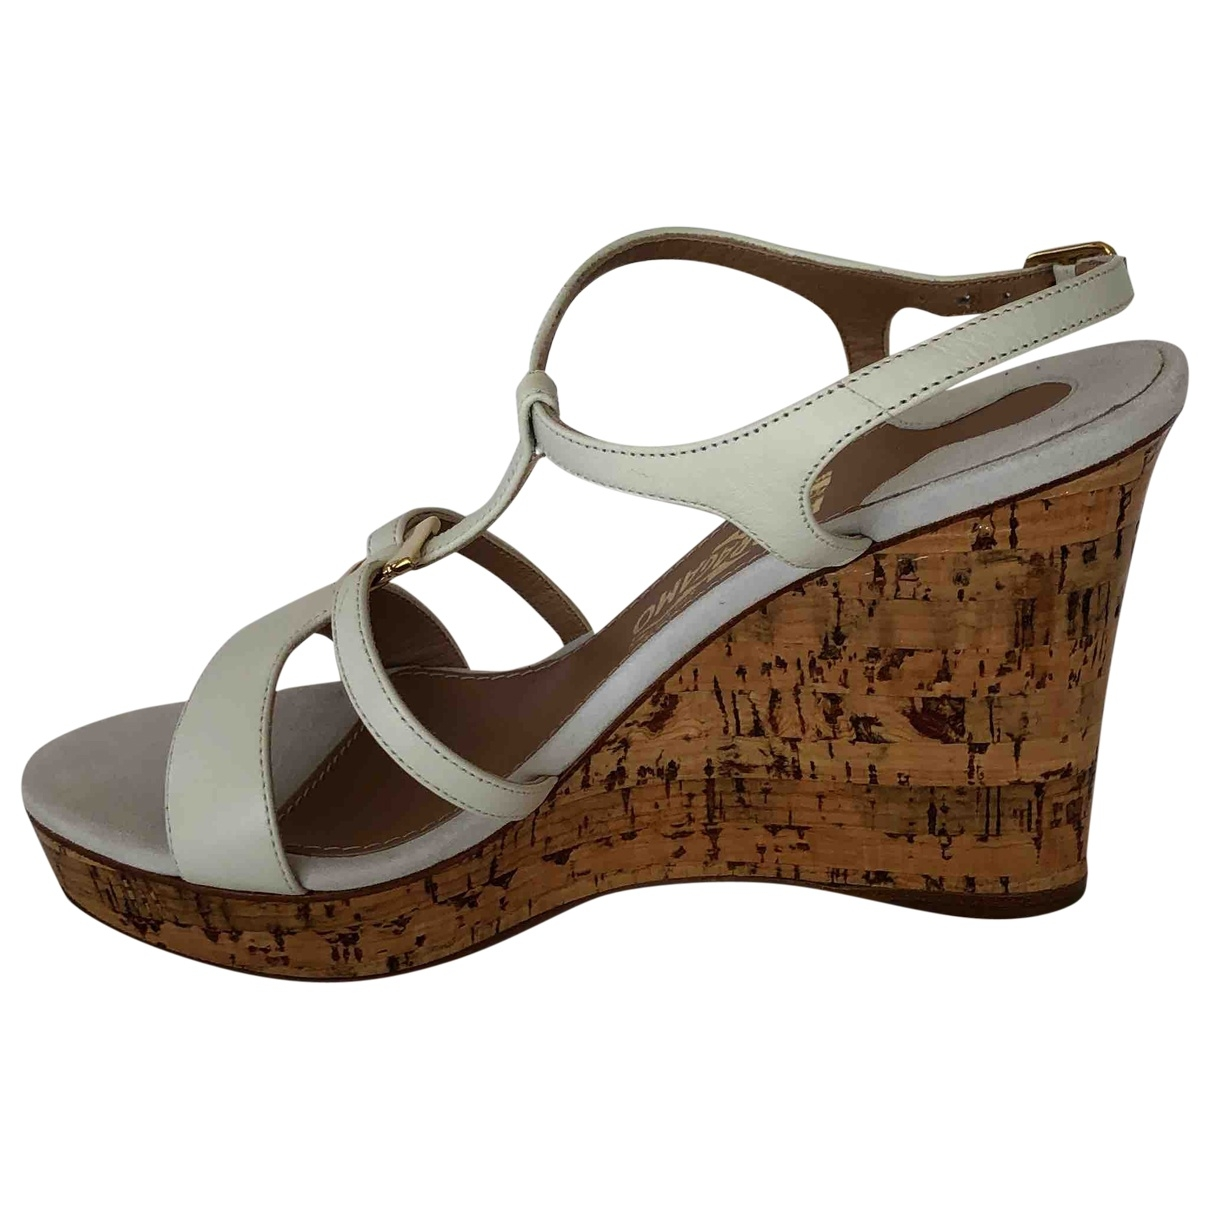 Salvatore Ferragamo \N White Leather Sandals for Women 6 US